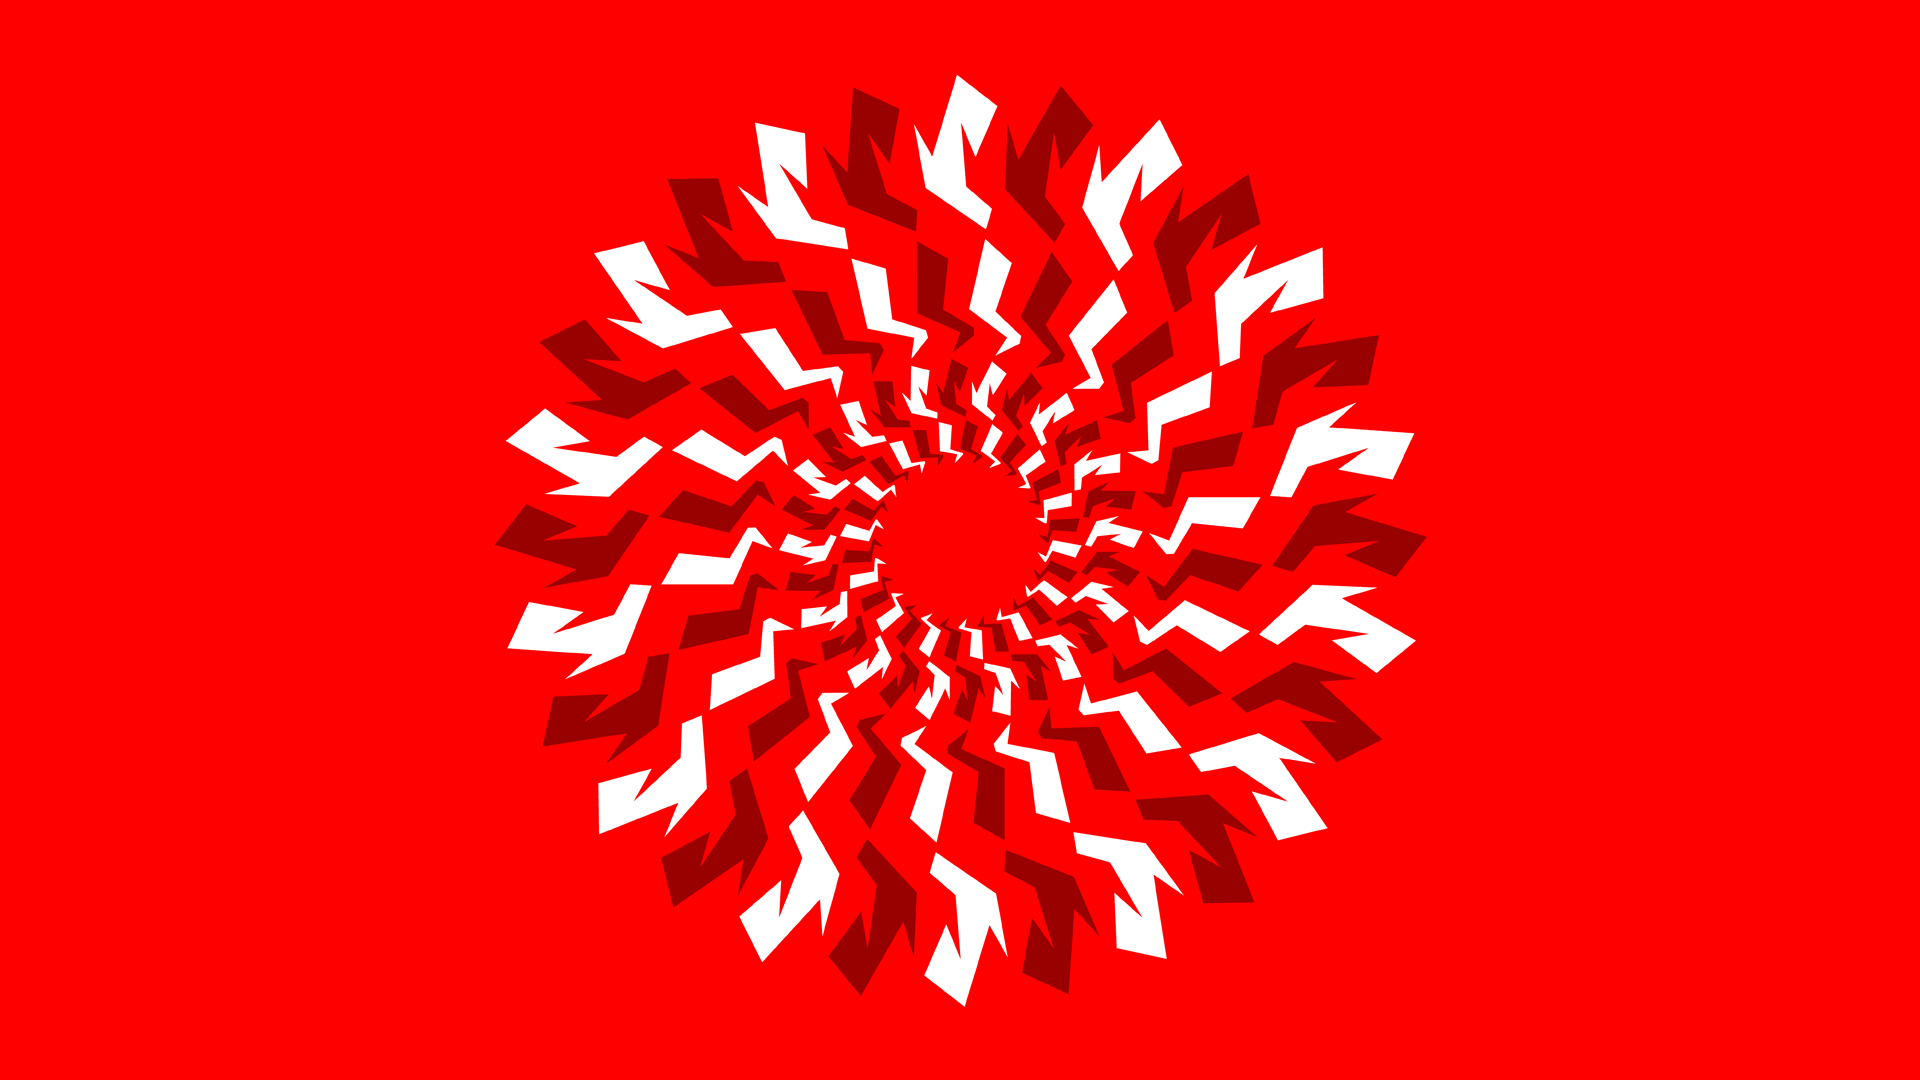 redHot 2019 Centerpiece Graphic